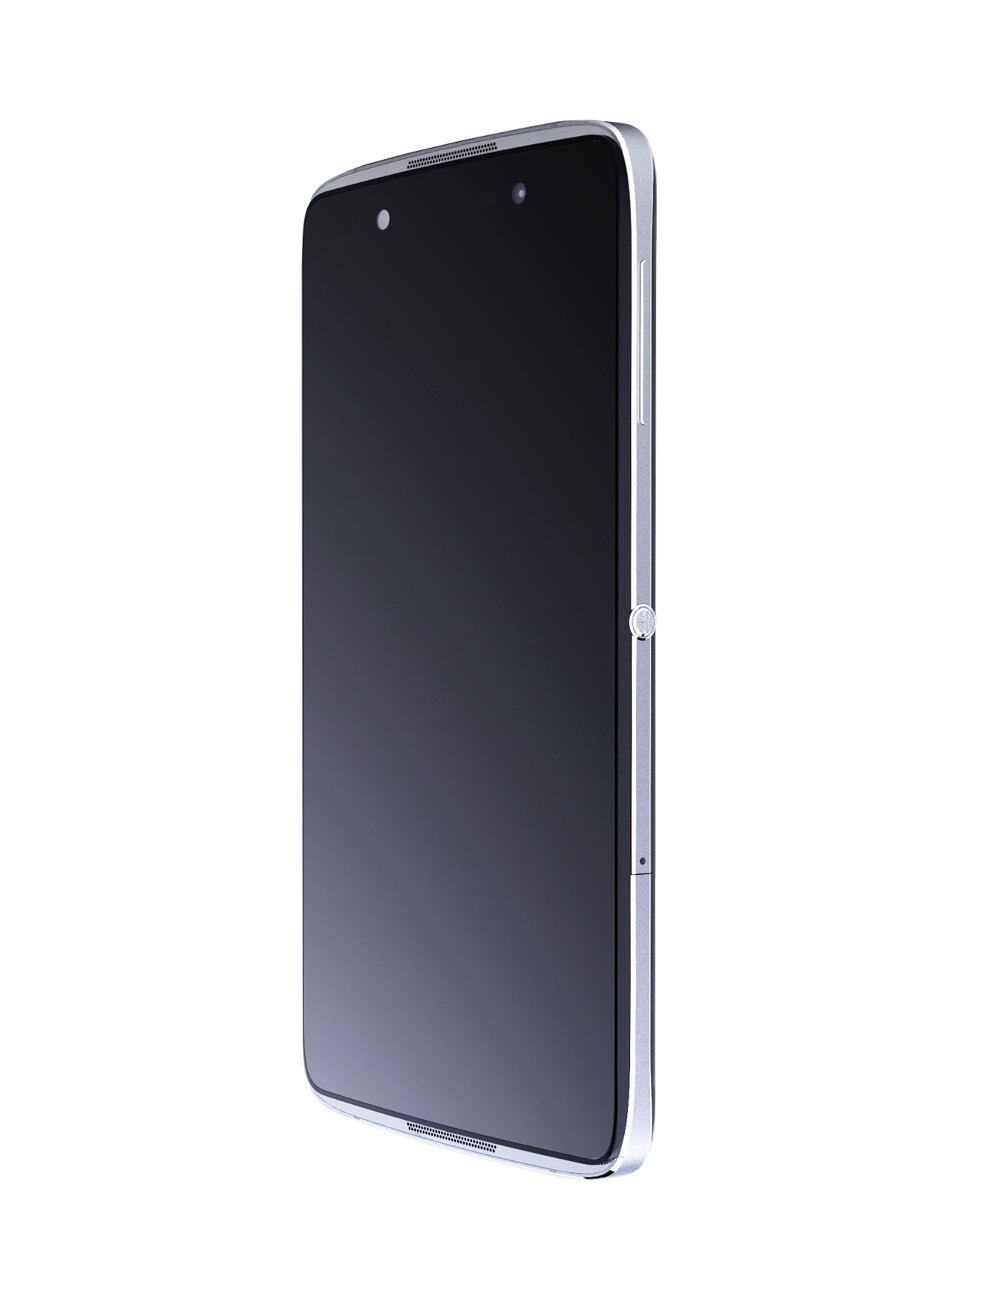 user manual for alcatel mobile phone